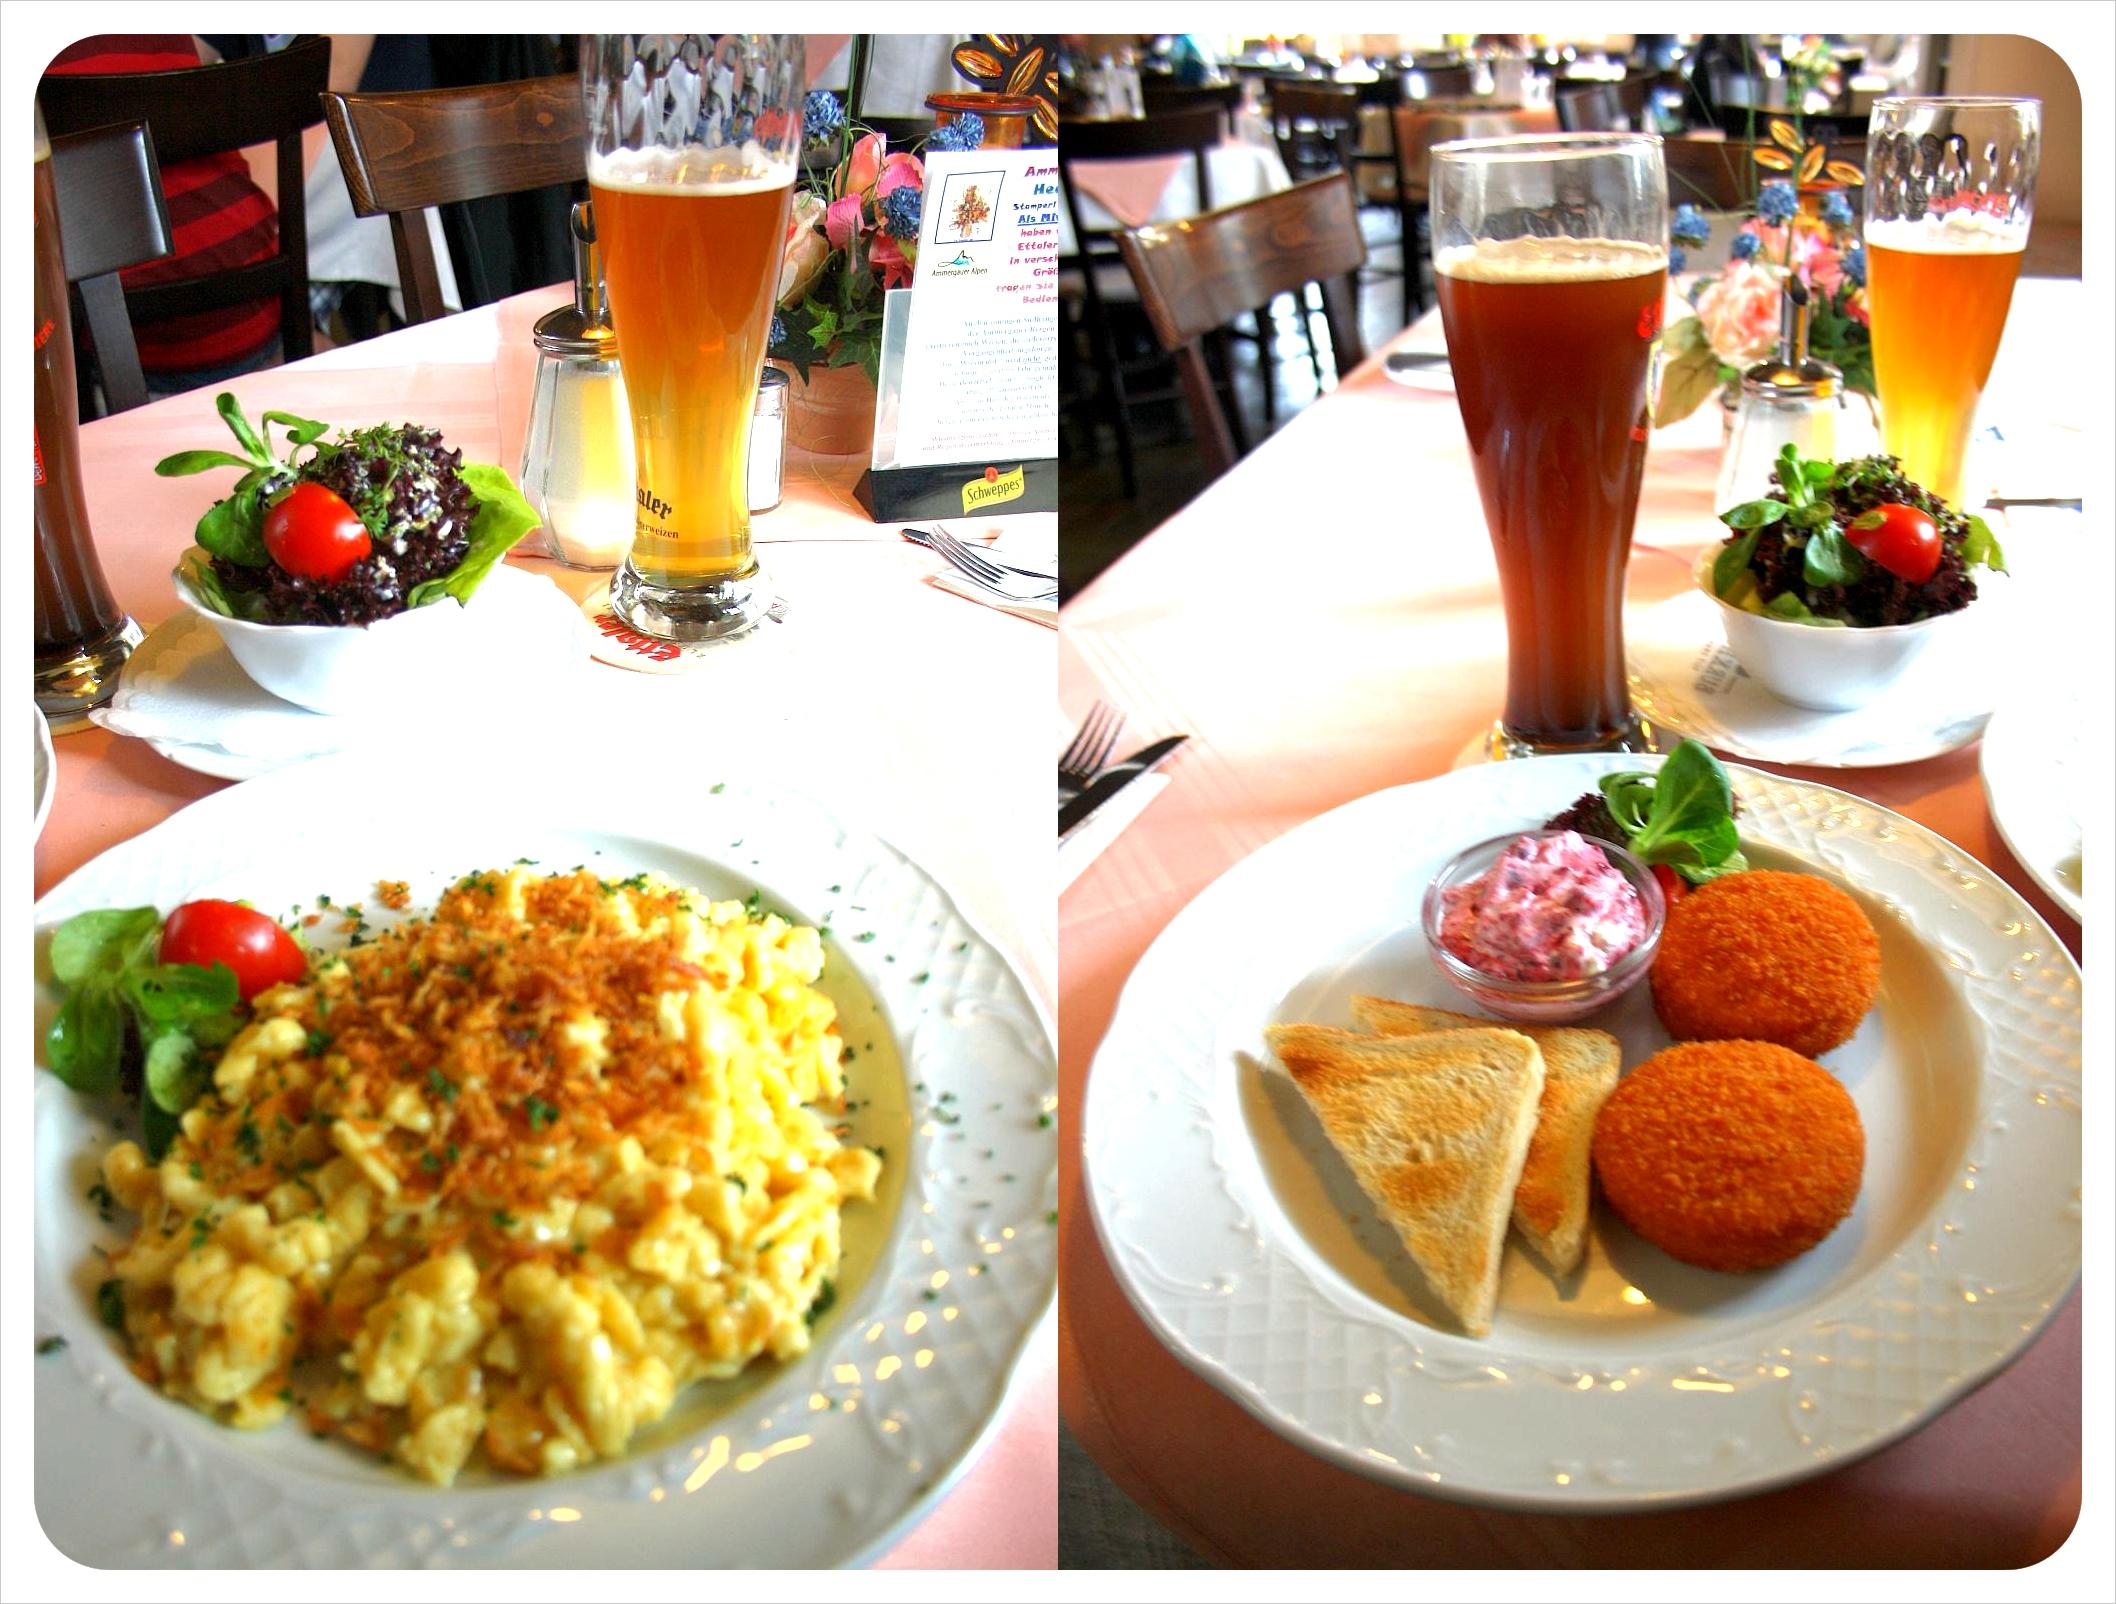 Bavarian food & Hefeweizen beer